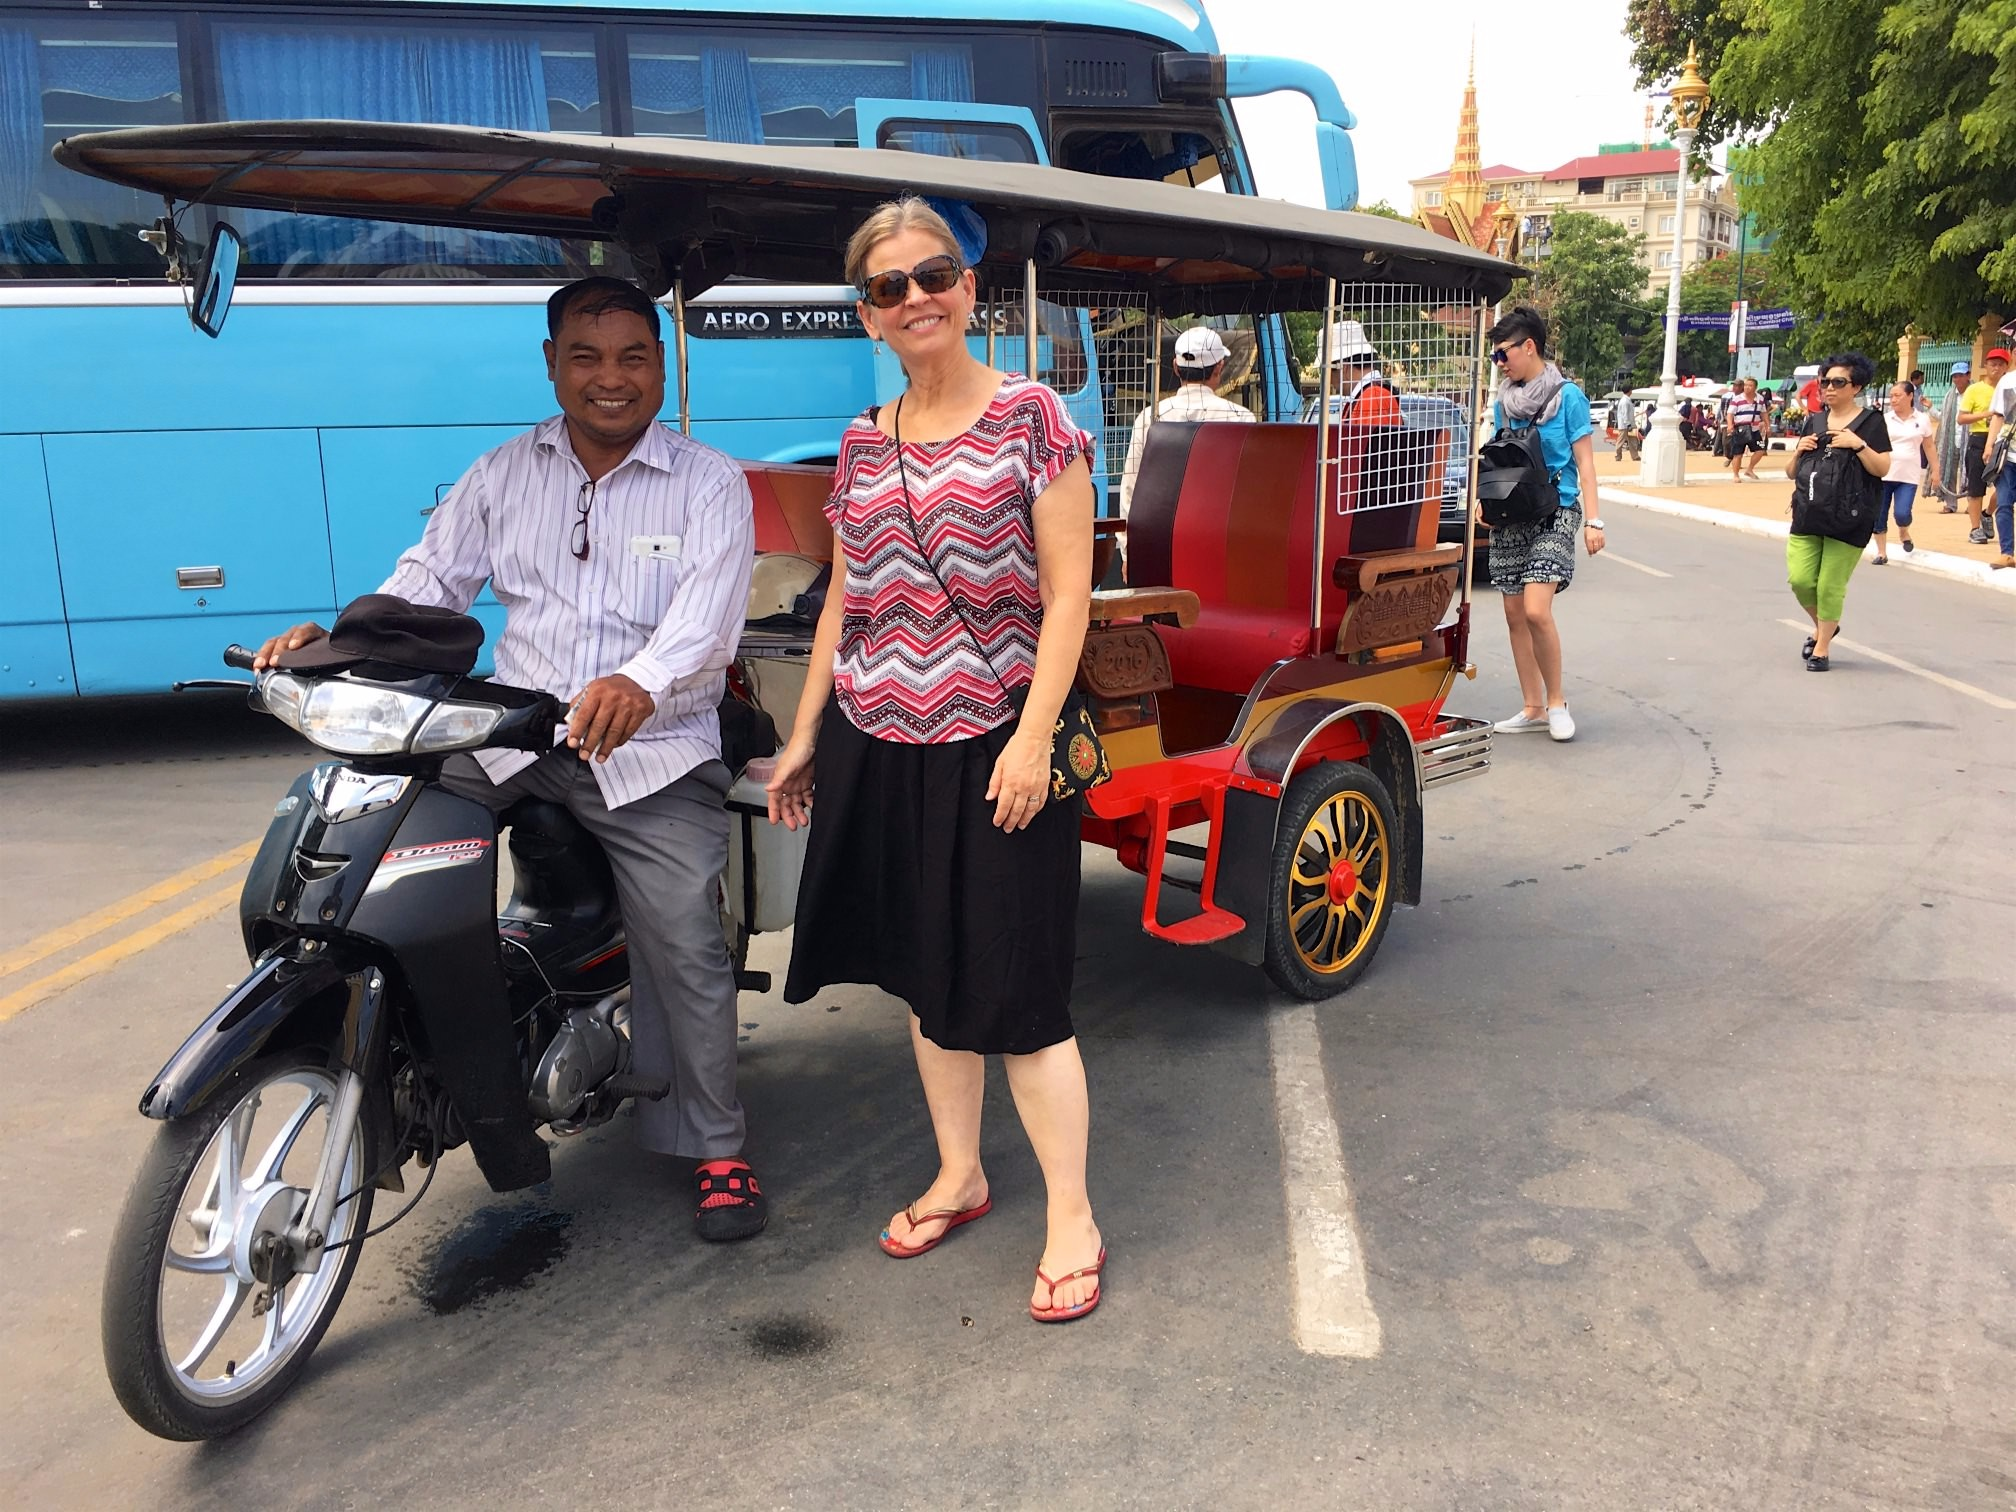 2016-06-11-Phnom-Penh-KH-Tuk-Tuk-Around-Town-17687.jpg